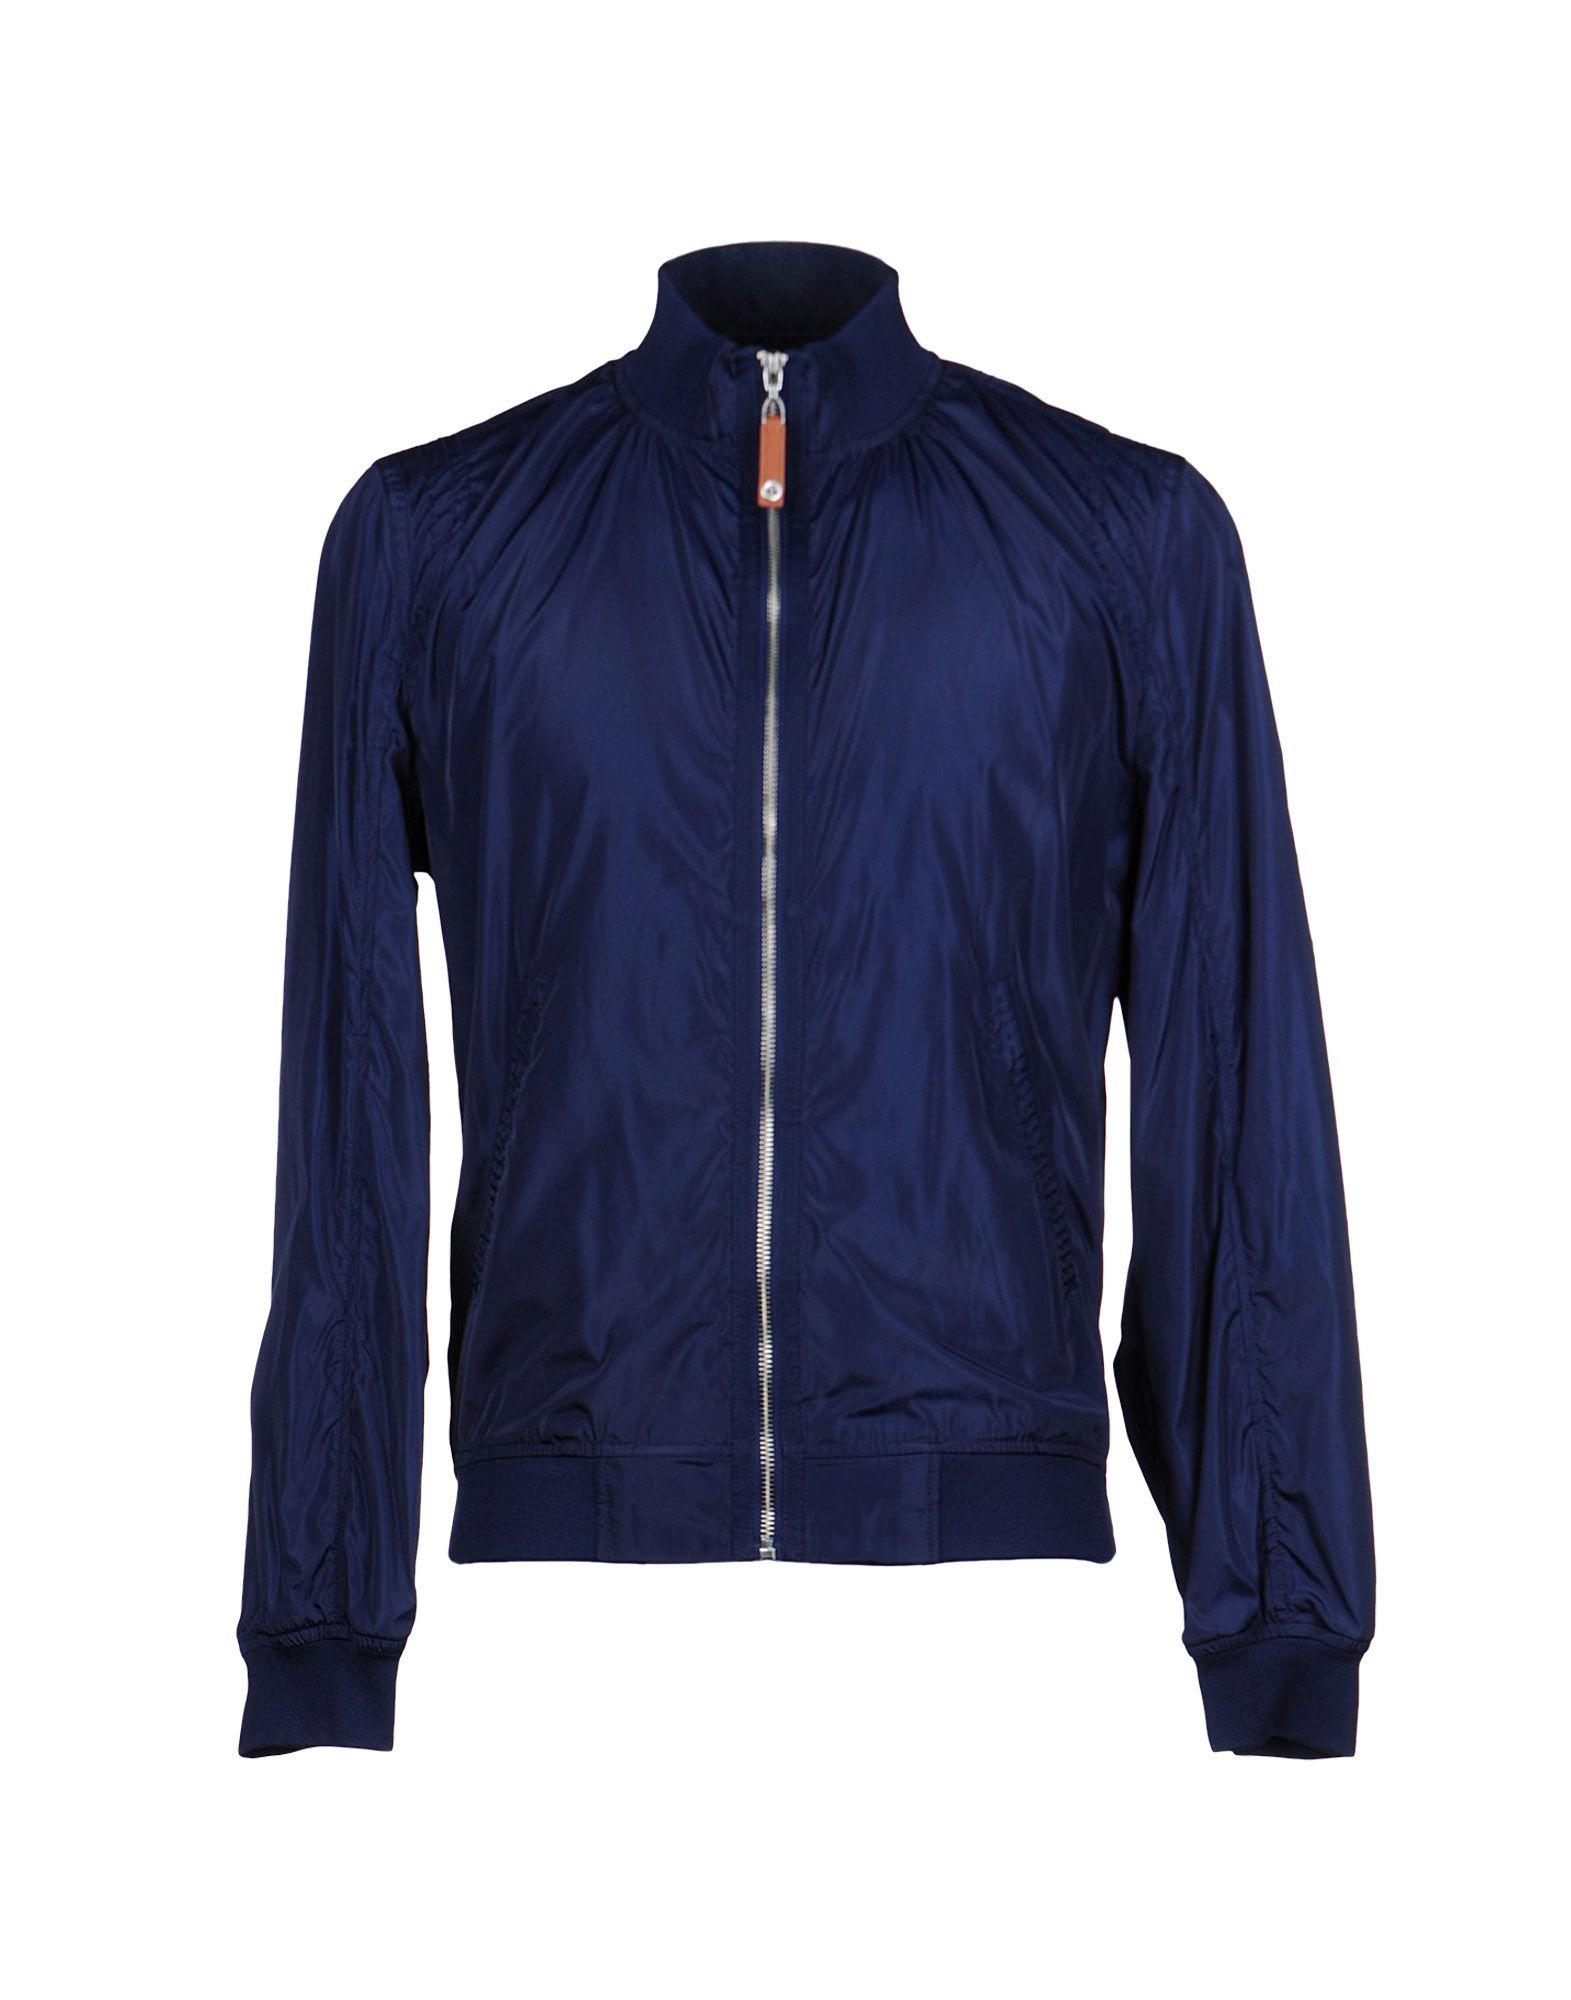 Class Roberto Cavalli Jacket in Blue for Men - Lyst c81cbe882